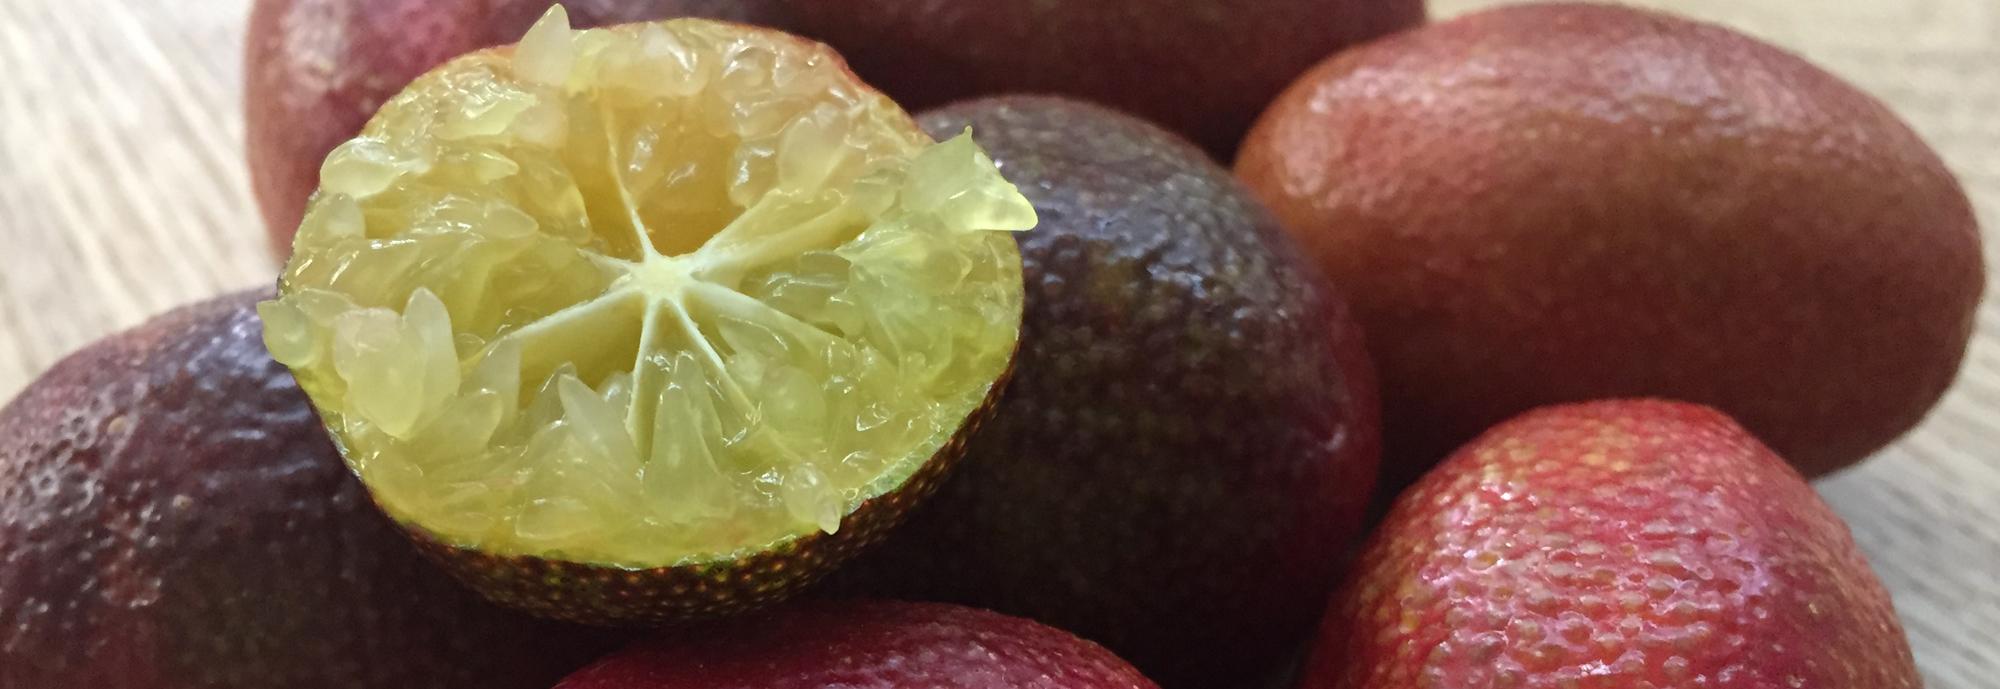 blood_lime_citron_caviar